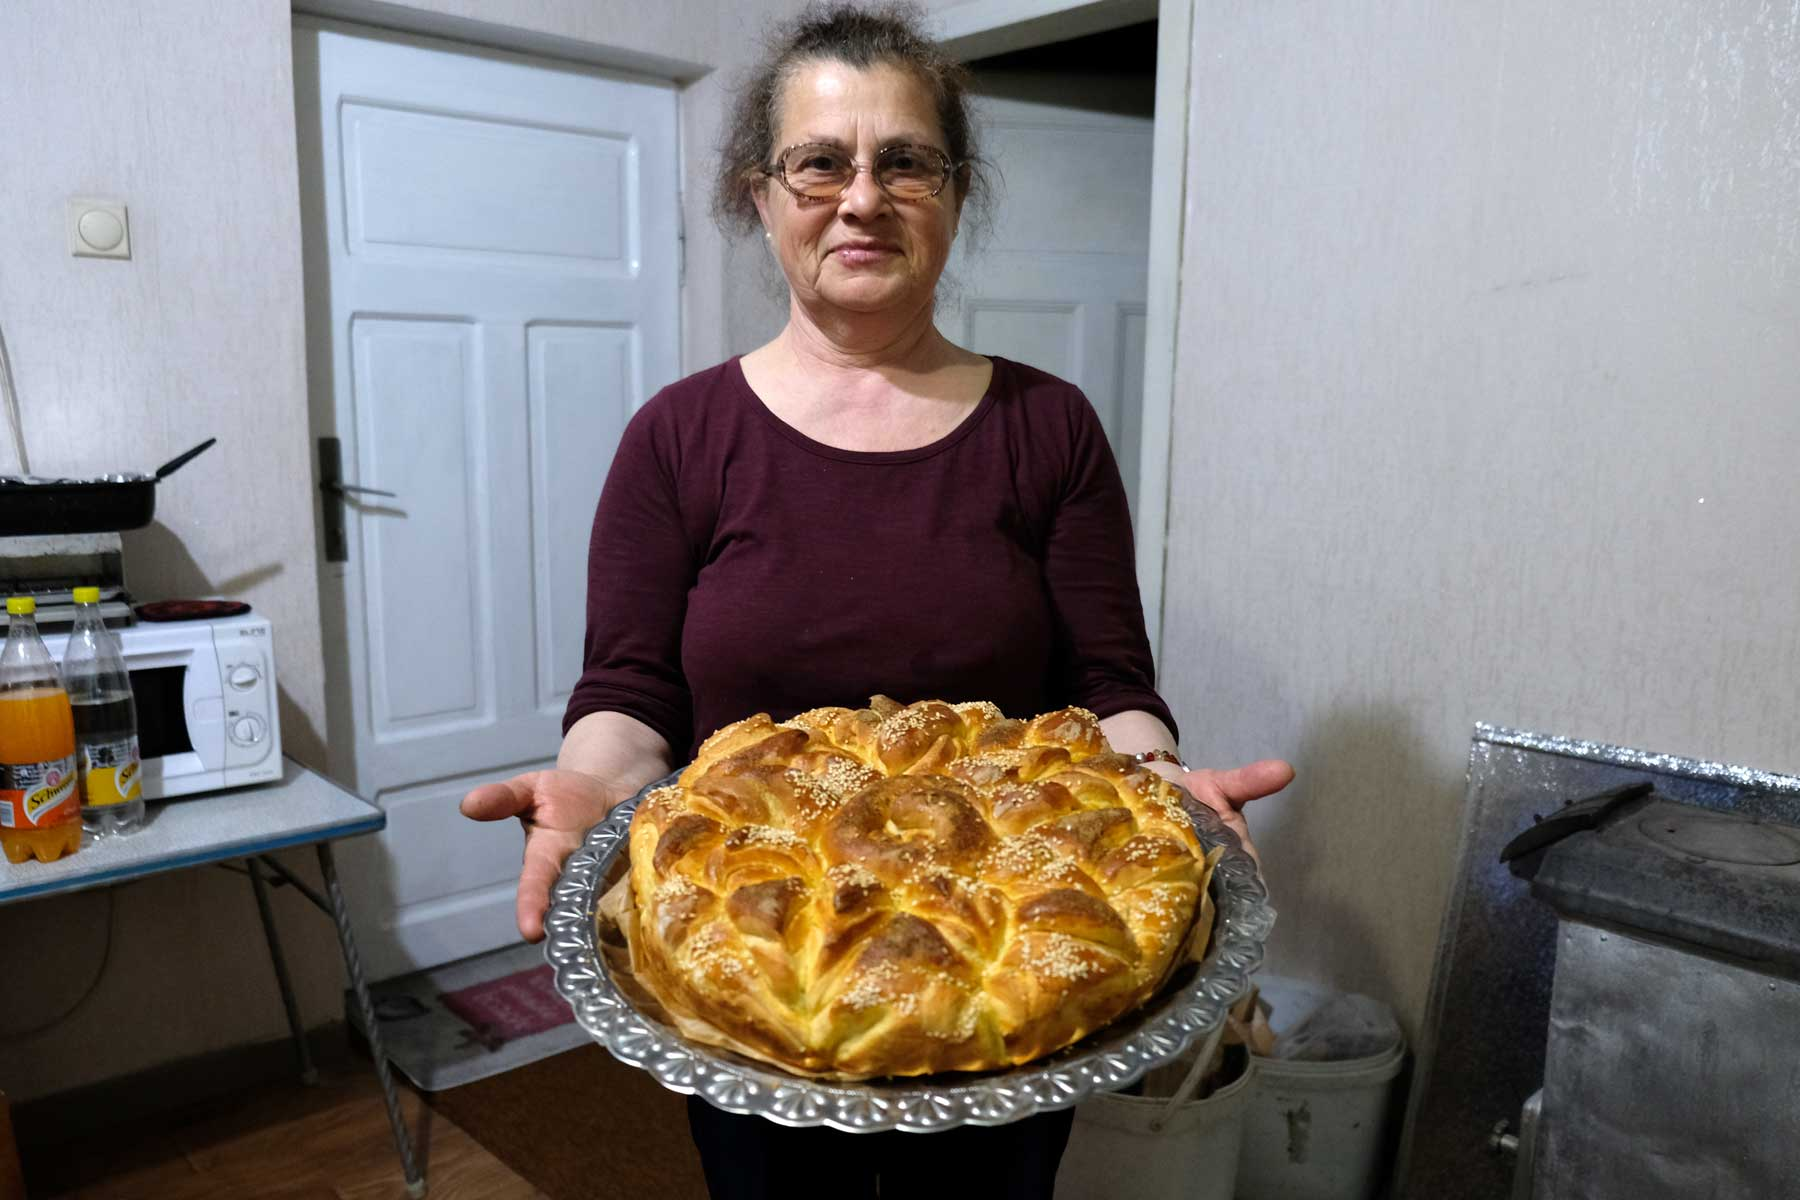 Petranka präsentiert die fertige Pitka